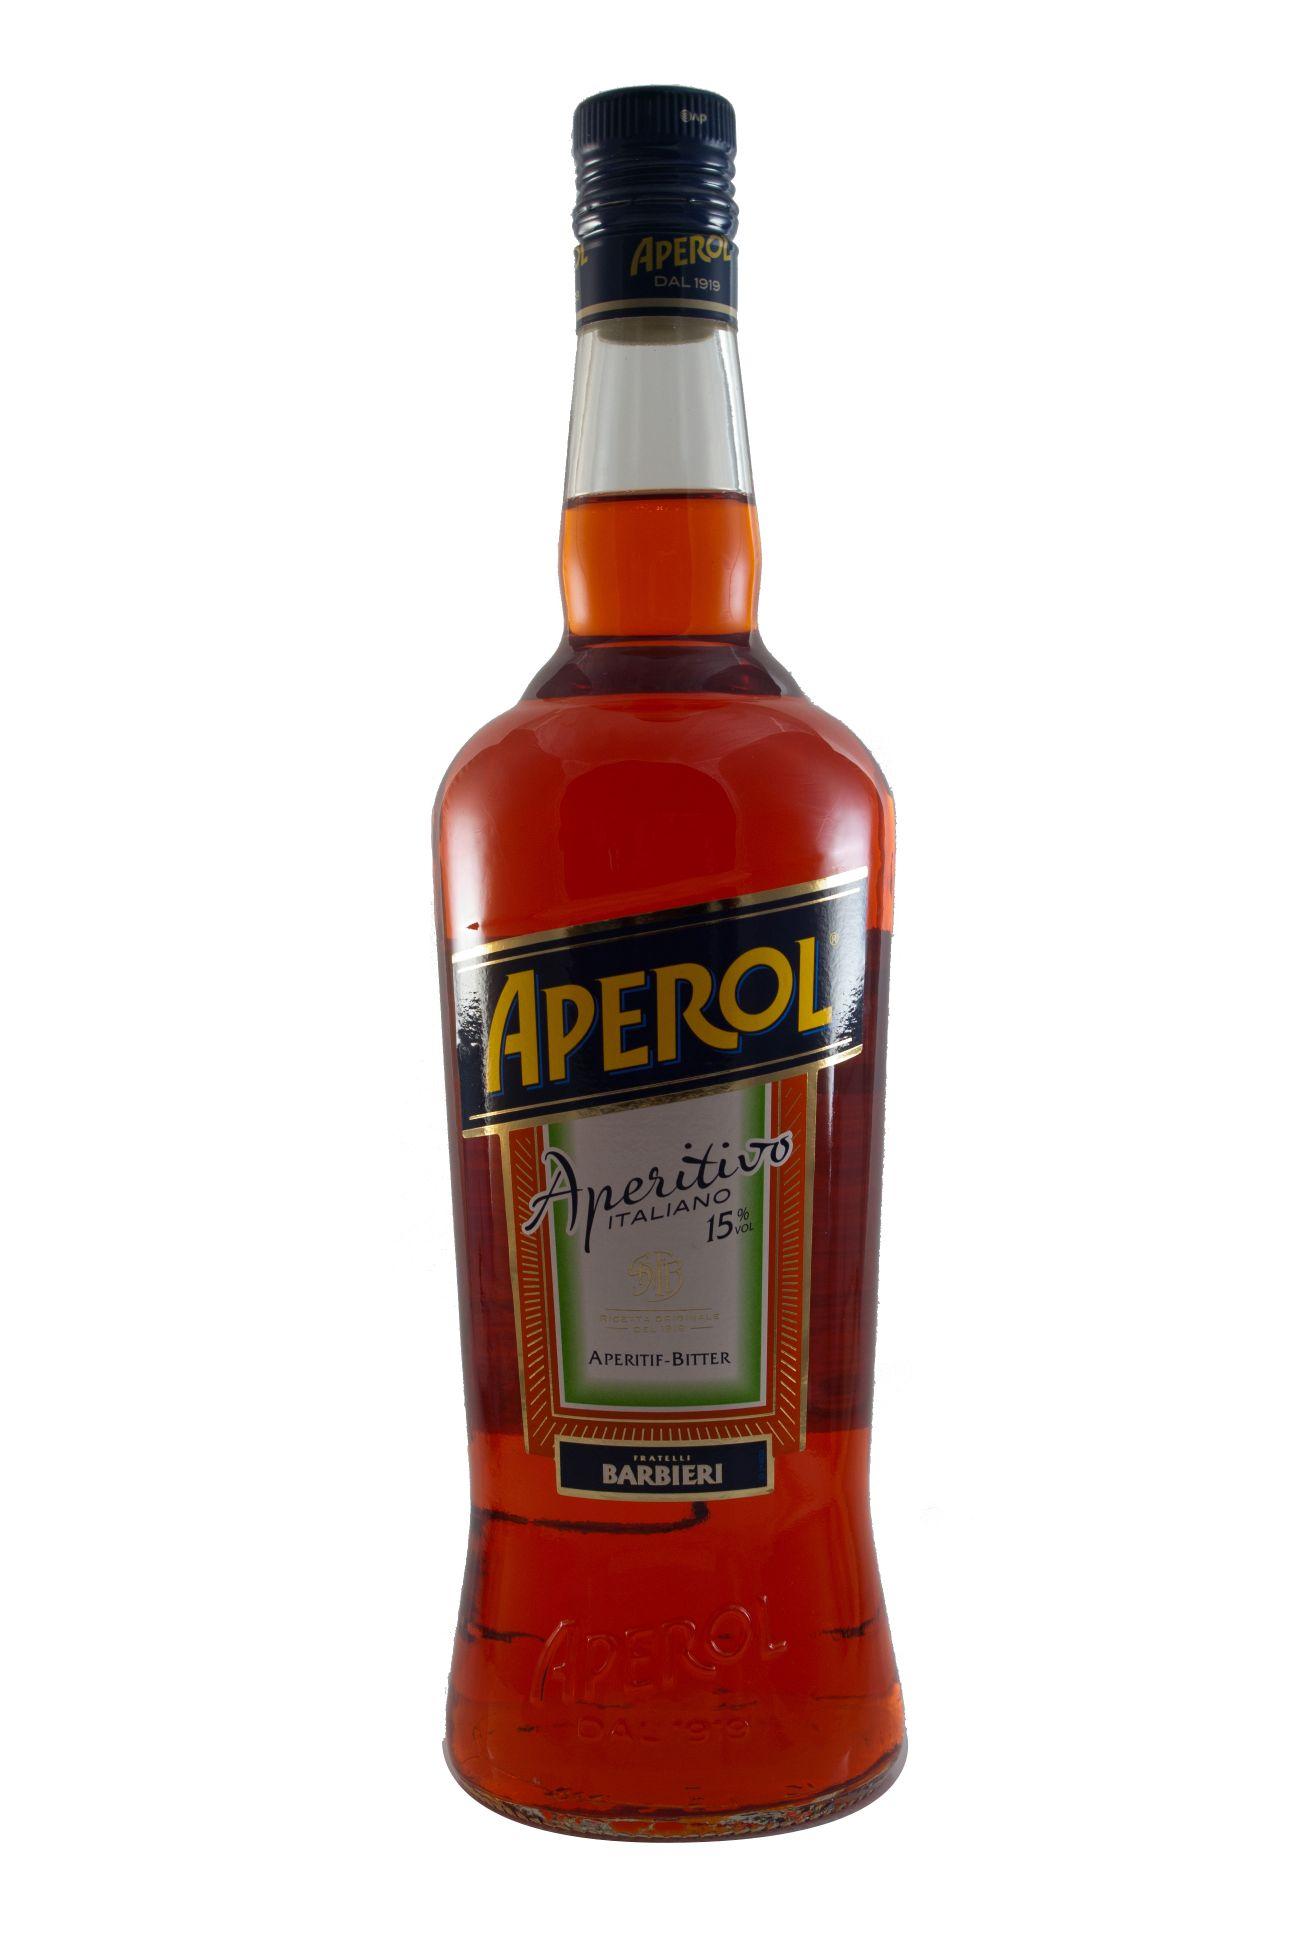 aperol aperitif bitter 1 liter kaufen ab 14 47 eur im. Black Bedroom Furniture Sets. Home Design Ideas